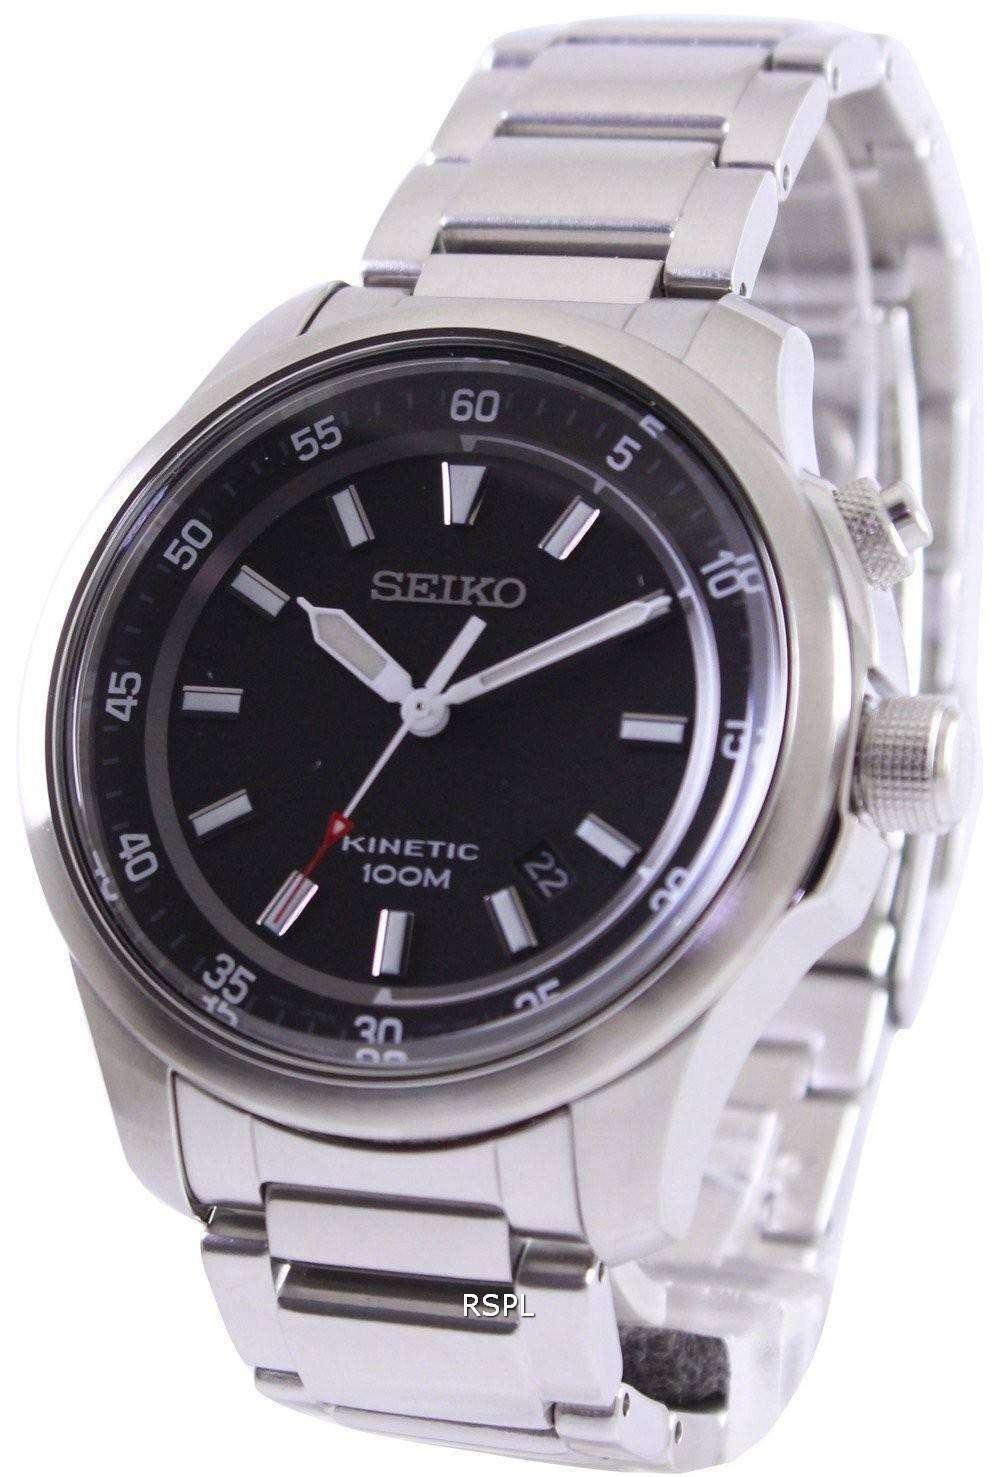 Seiko neo sports kinetic 100m black dial ska685p1 ska685p mens watch for Movado kinetic